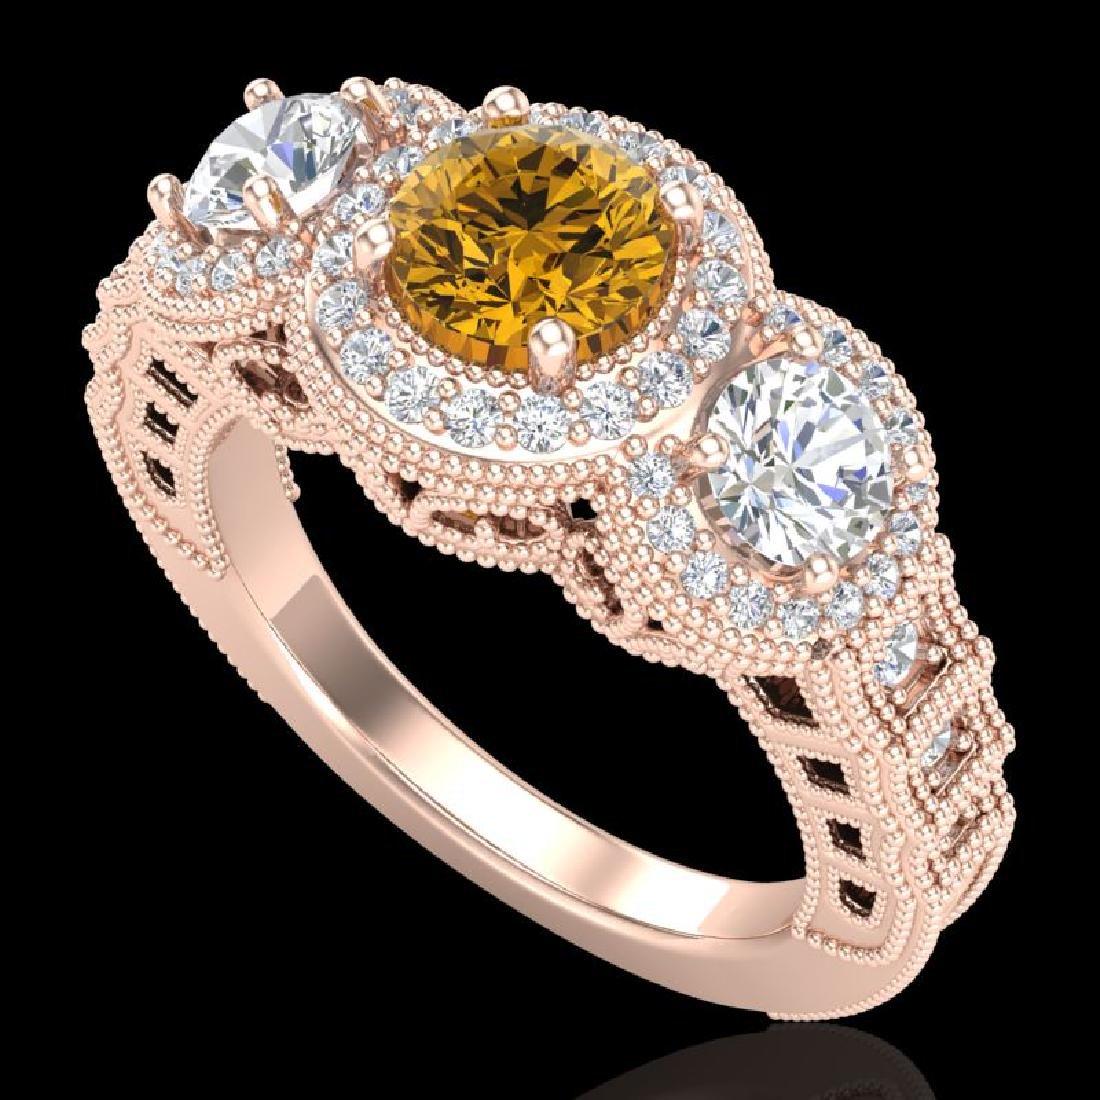 2.16 CTW Intense Fancy Yellow Diamond Art Deco 3 Stone